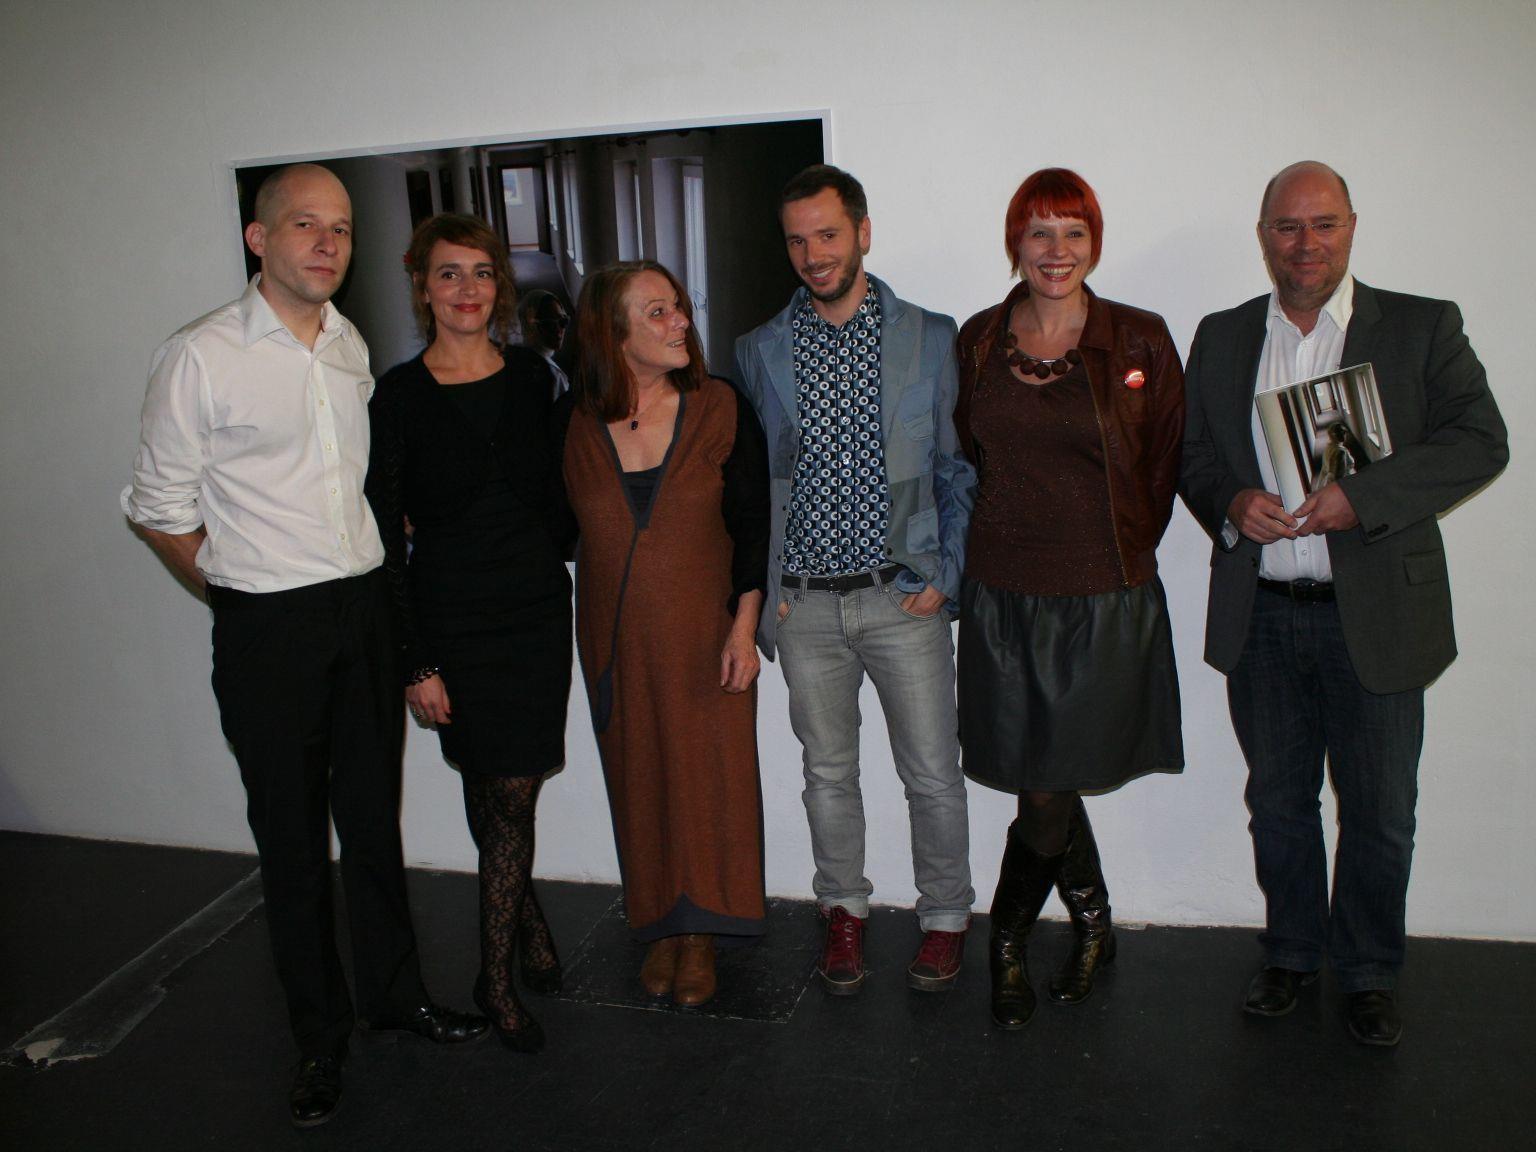 Stefan Geissler, Bella Angora, Lisi Hämmerle, Marko Zink, Michaela Stock, Andreas Rudigier (v.l.)